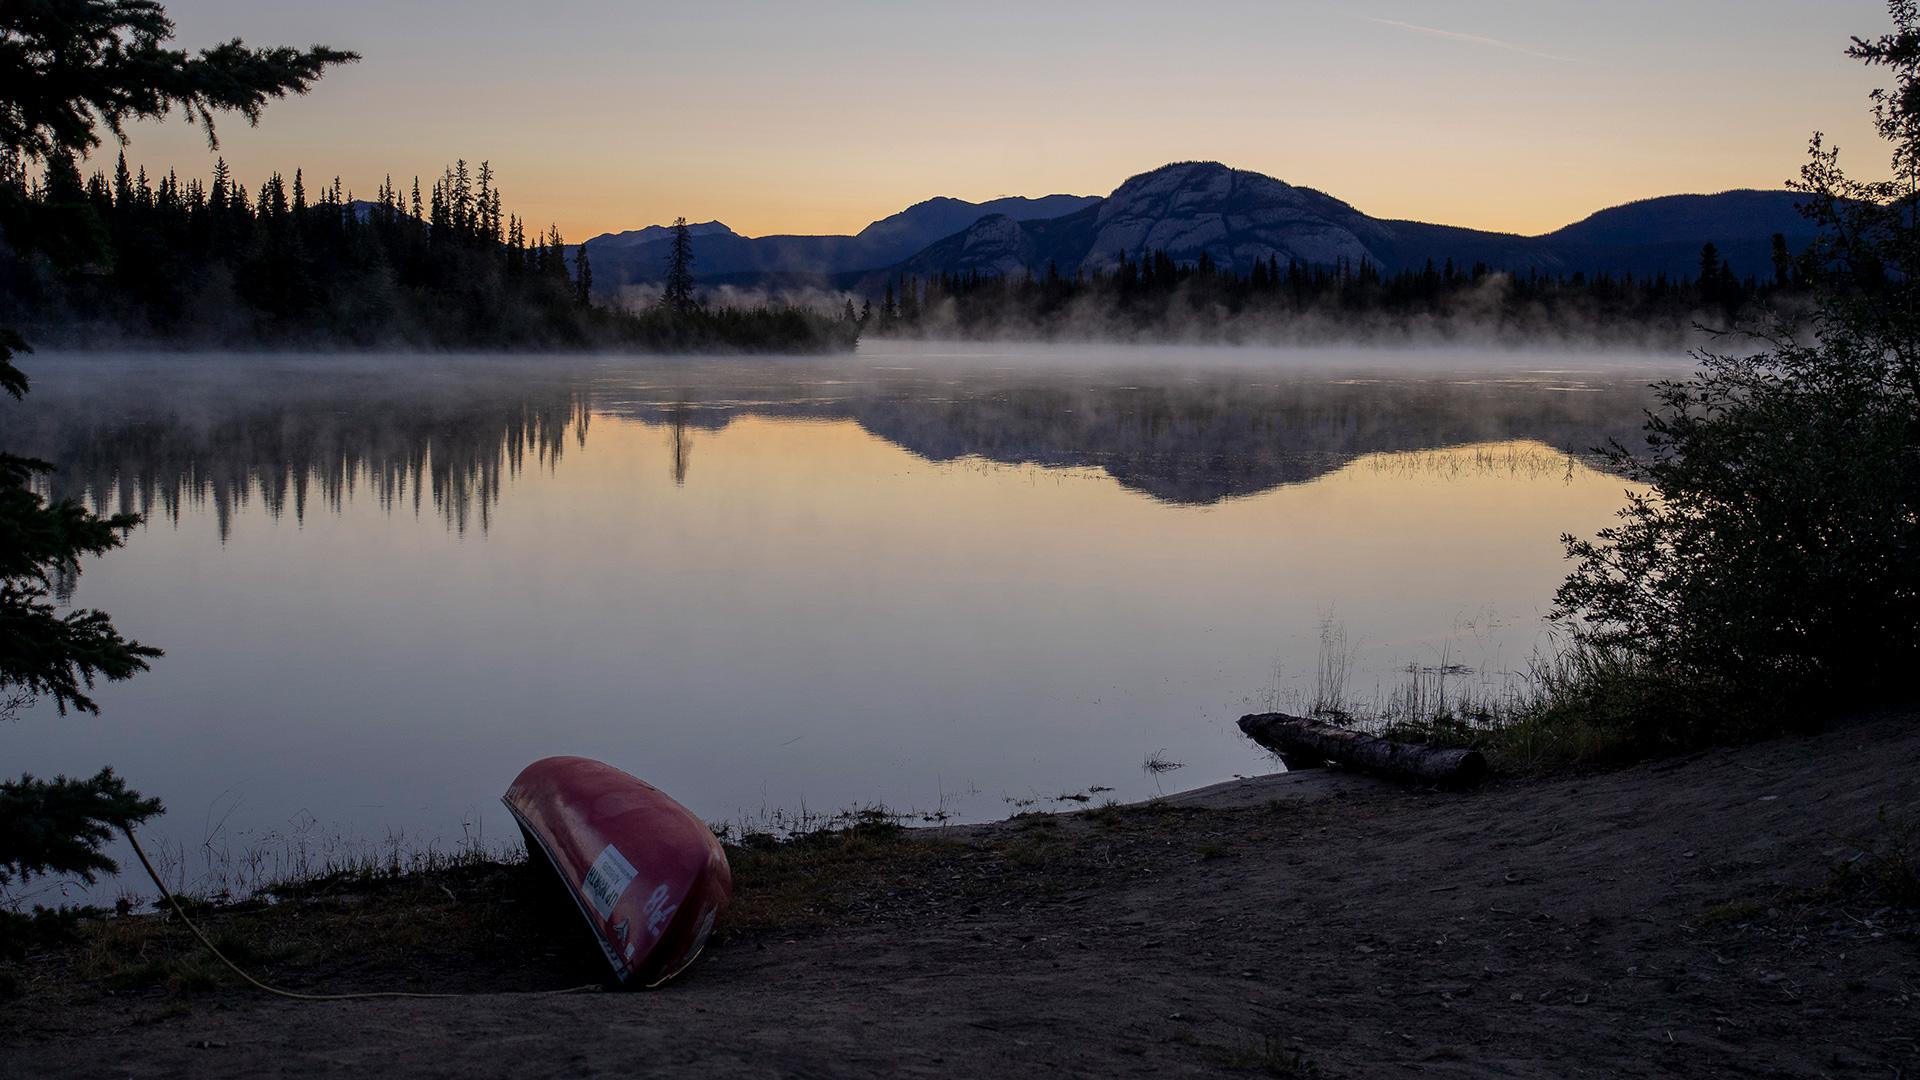 Dawn over the Yukon River